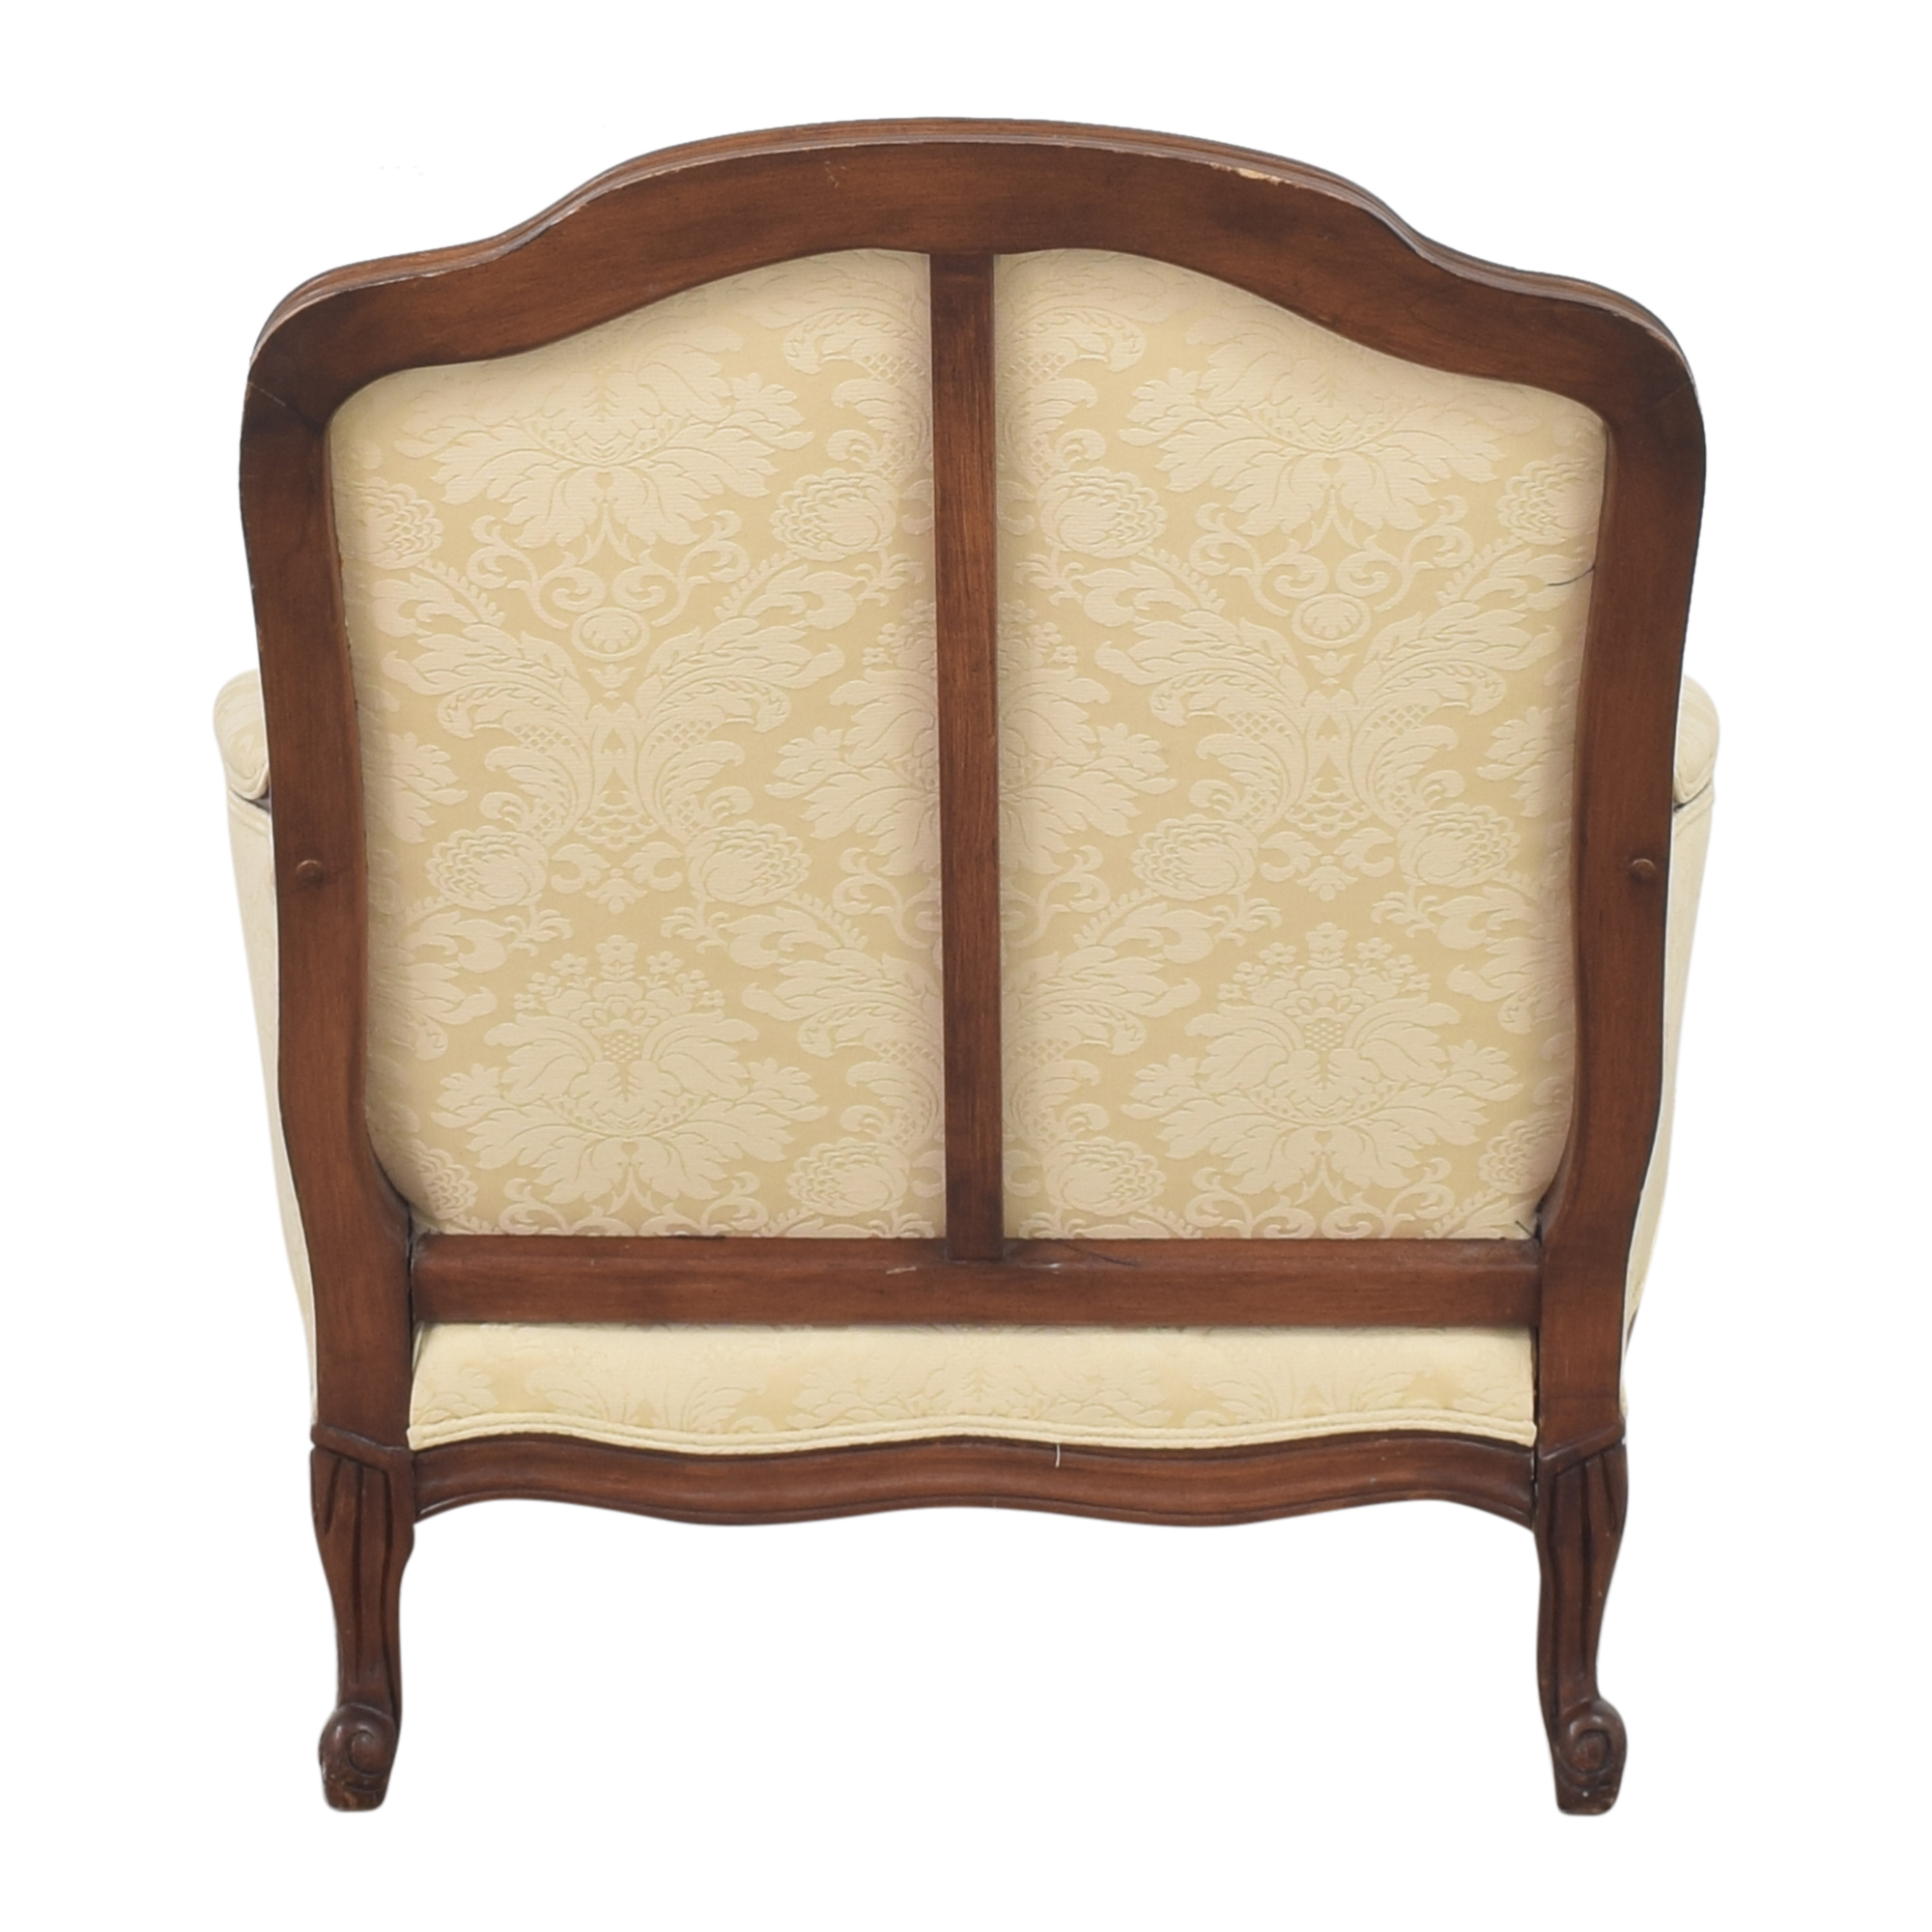 buy Huffman Koos Arm Chair with Ottoman Huffman Koos Accent Chairs